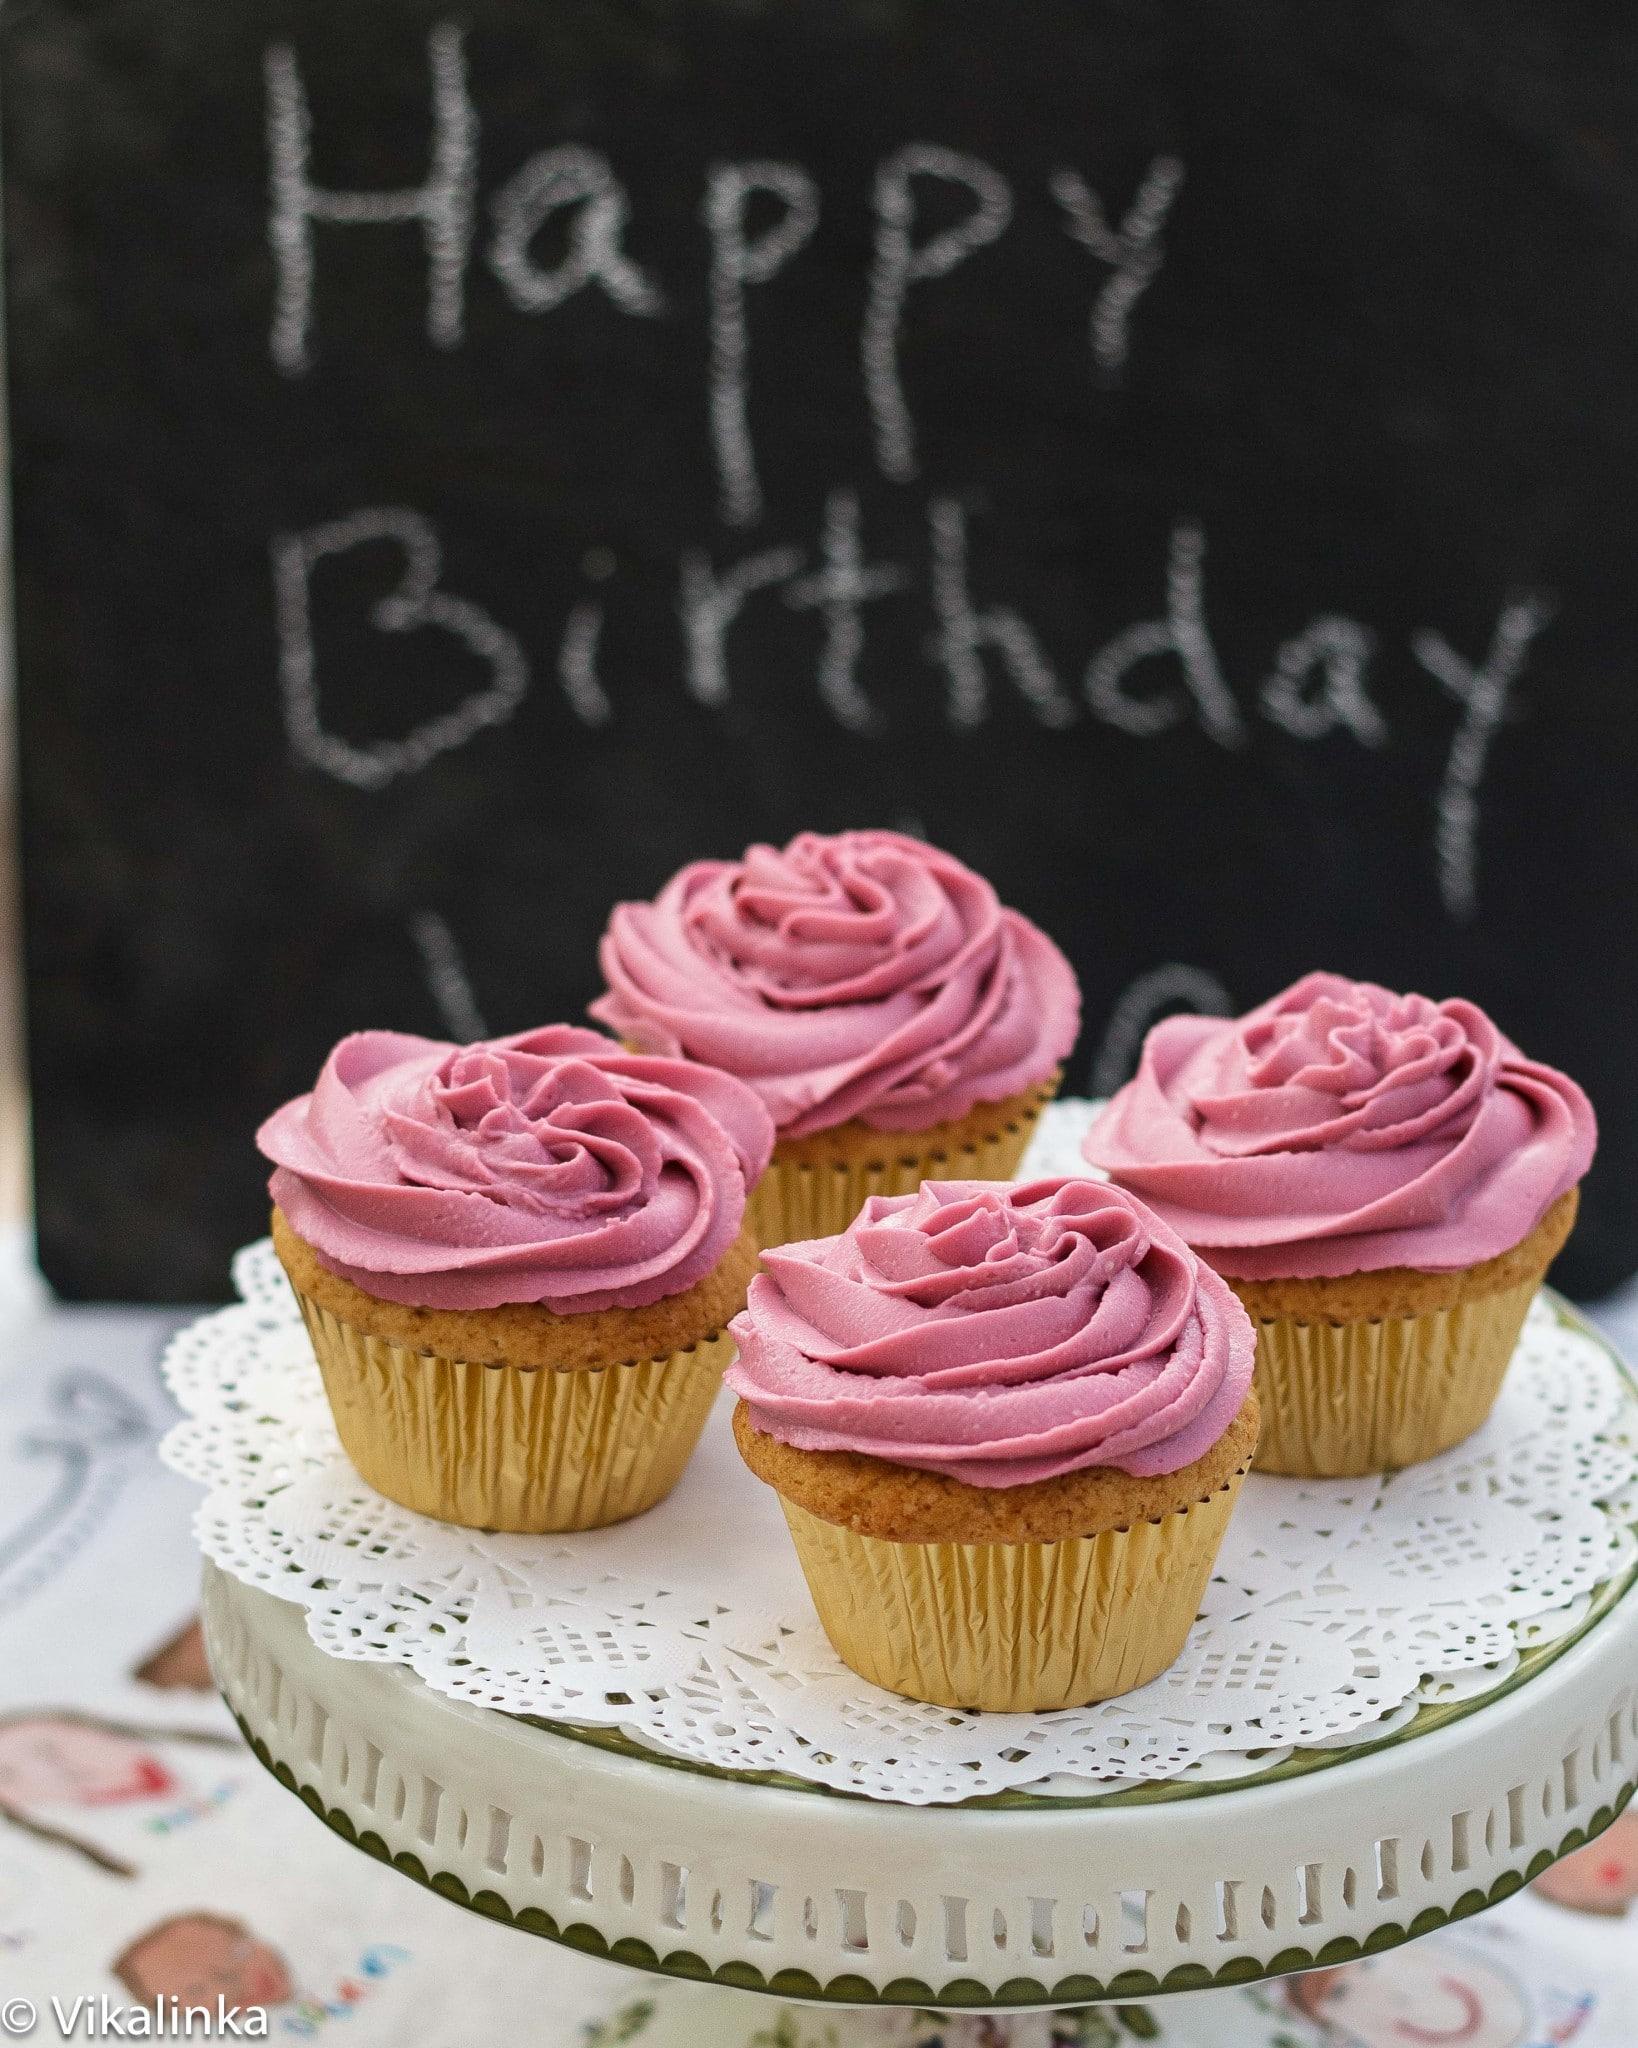 Awesome Wild Things Birthday Cupcakes Vikalinka Funny Birthday Cards Online Inifofree Goldxyz